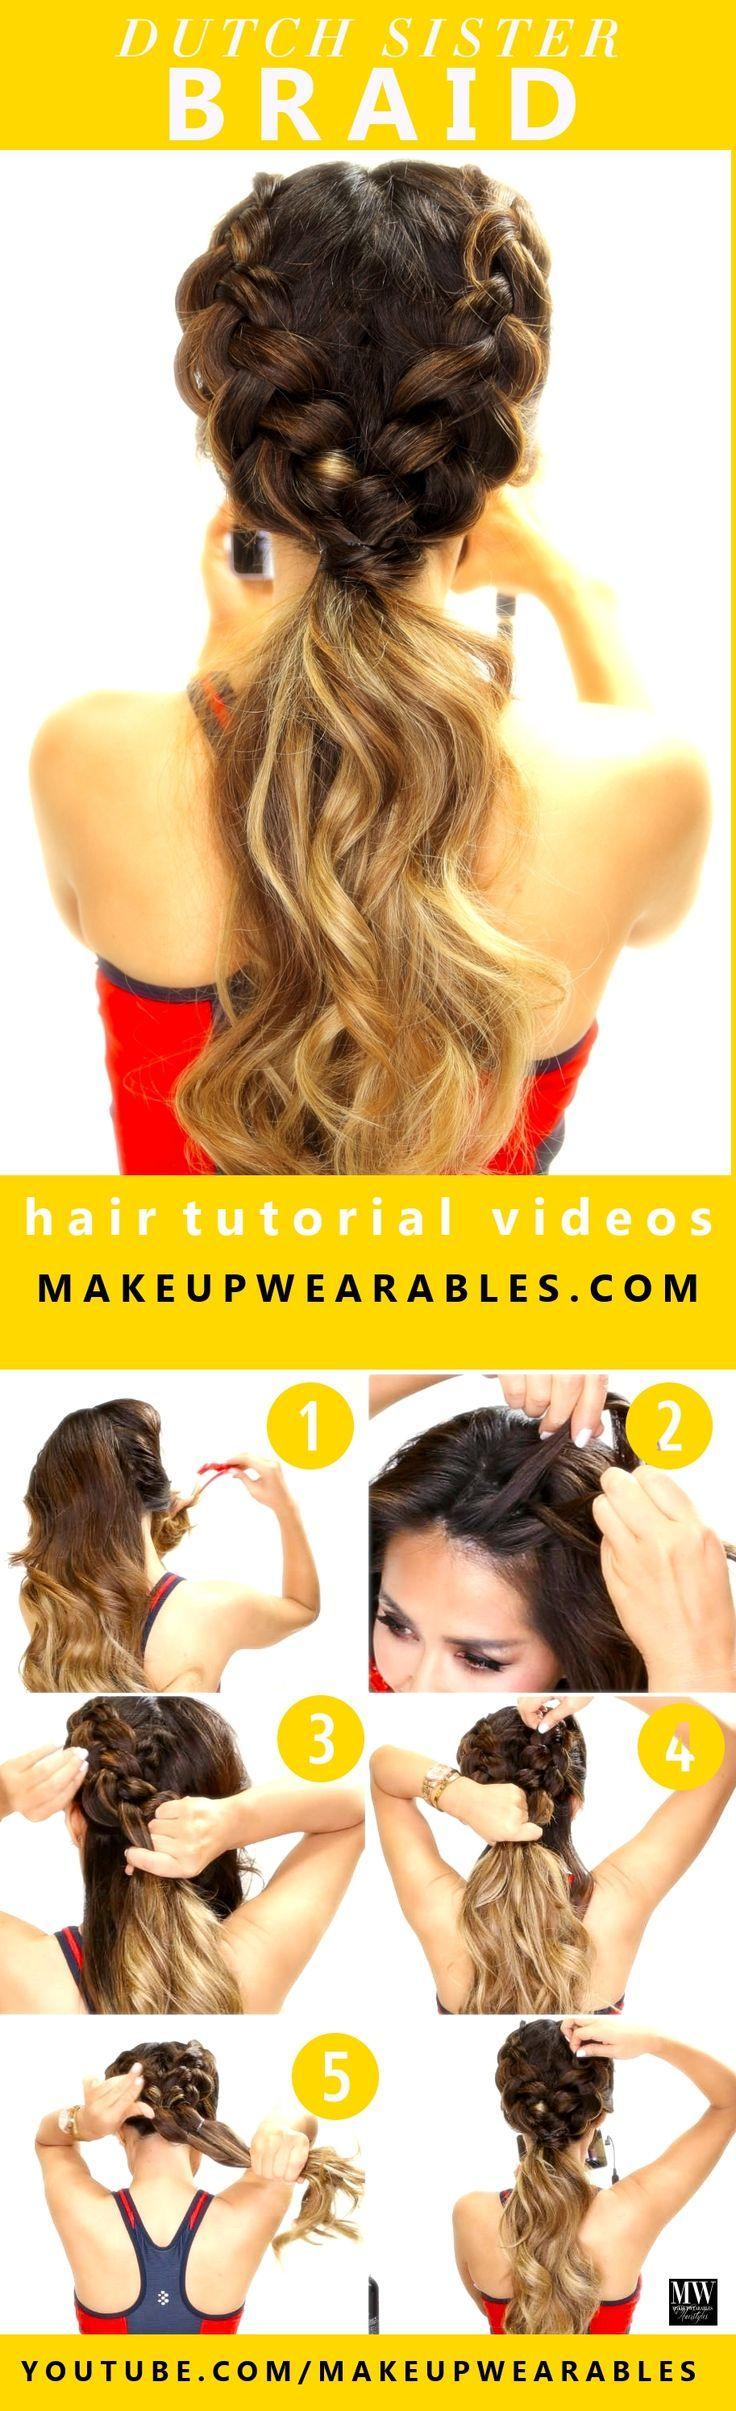 Awesome cutest braided hairstyles mohawk braid messy bun by